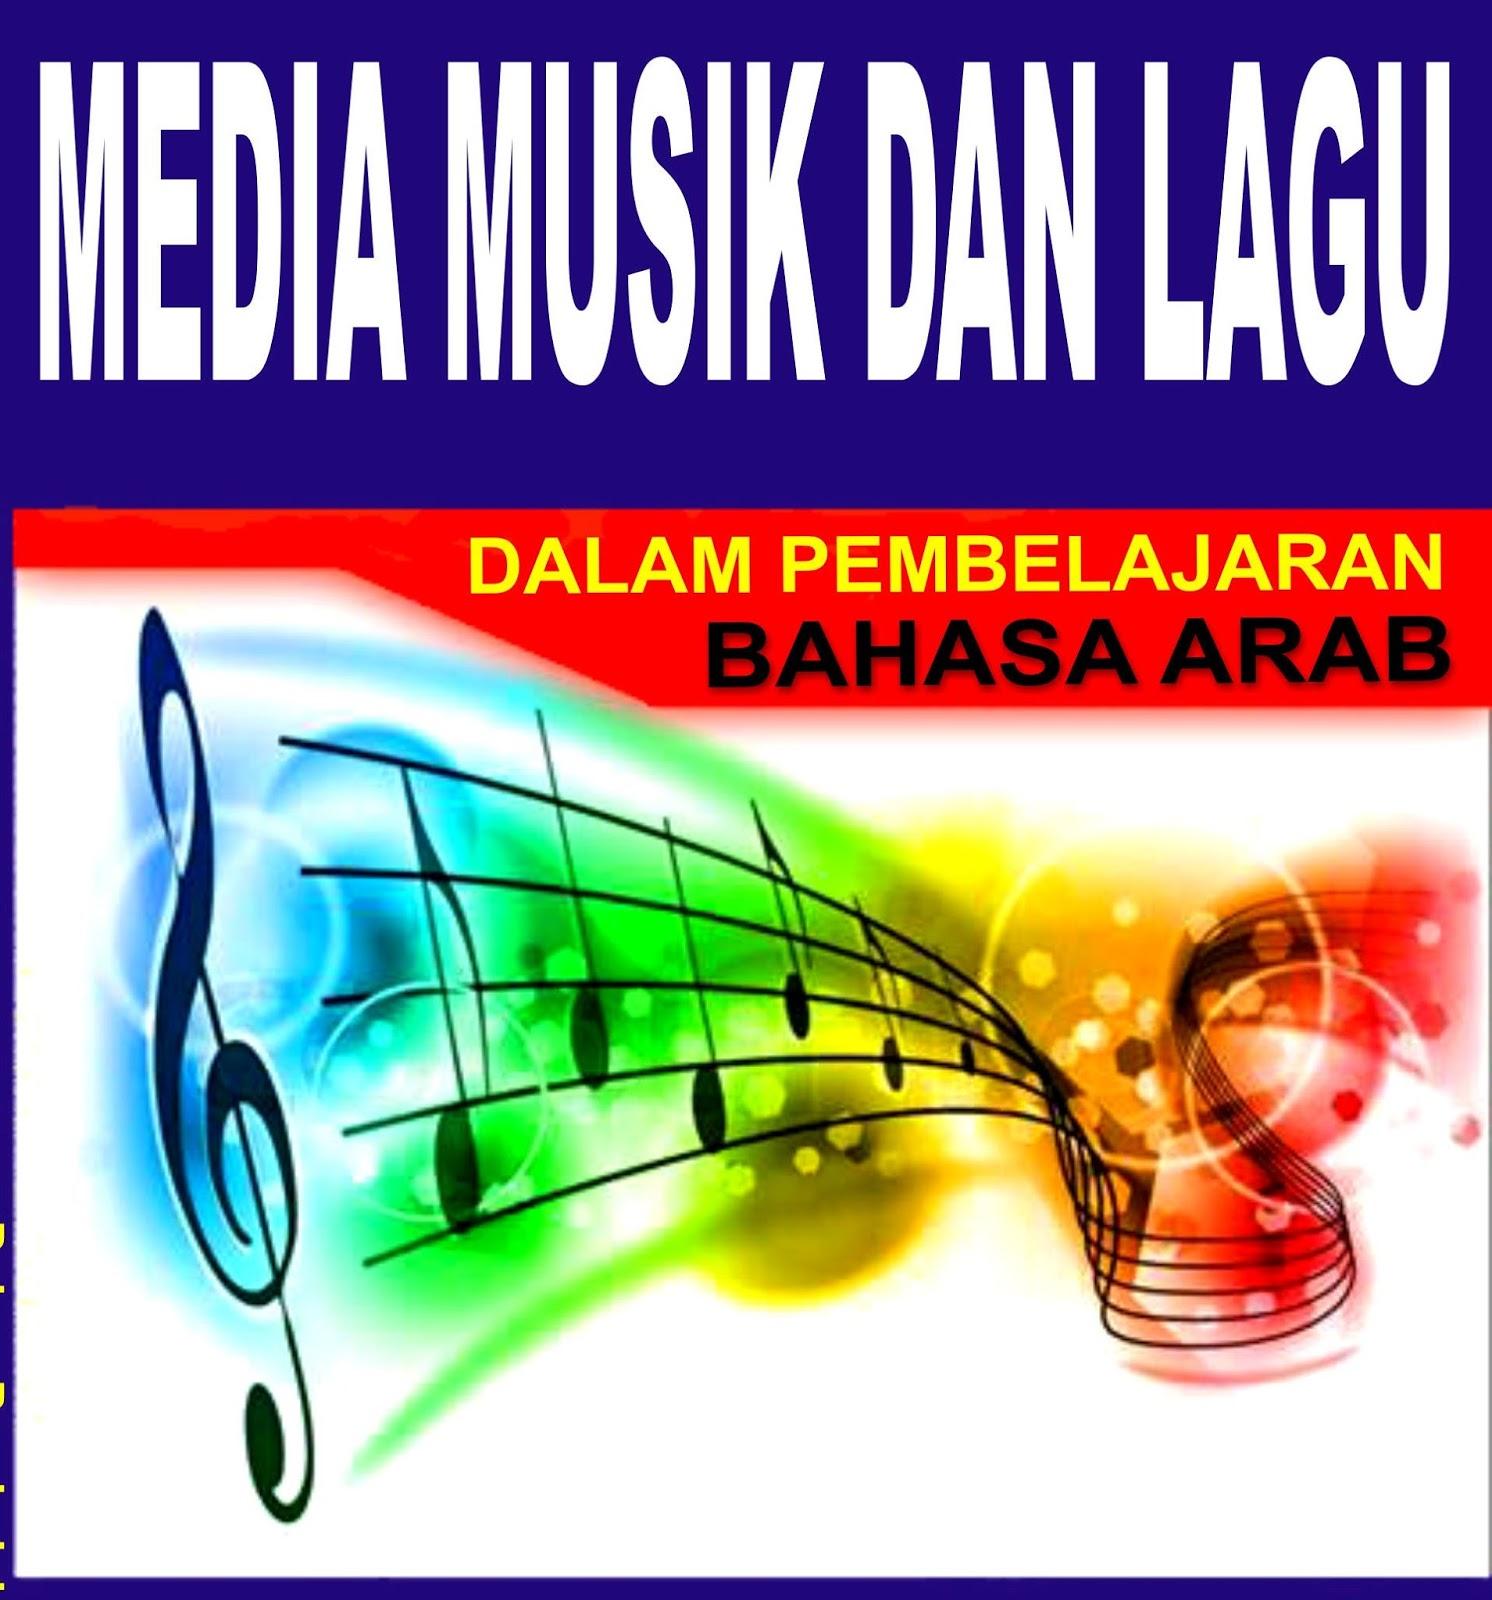 Media Musik Lagu Dalam Pembelajaran Bahasa Arab Tingkat Mi Hasan